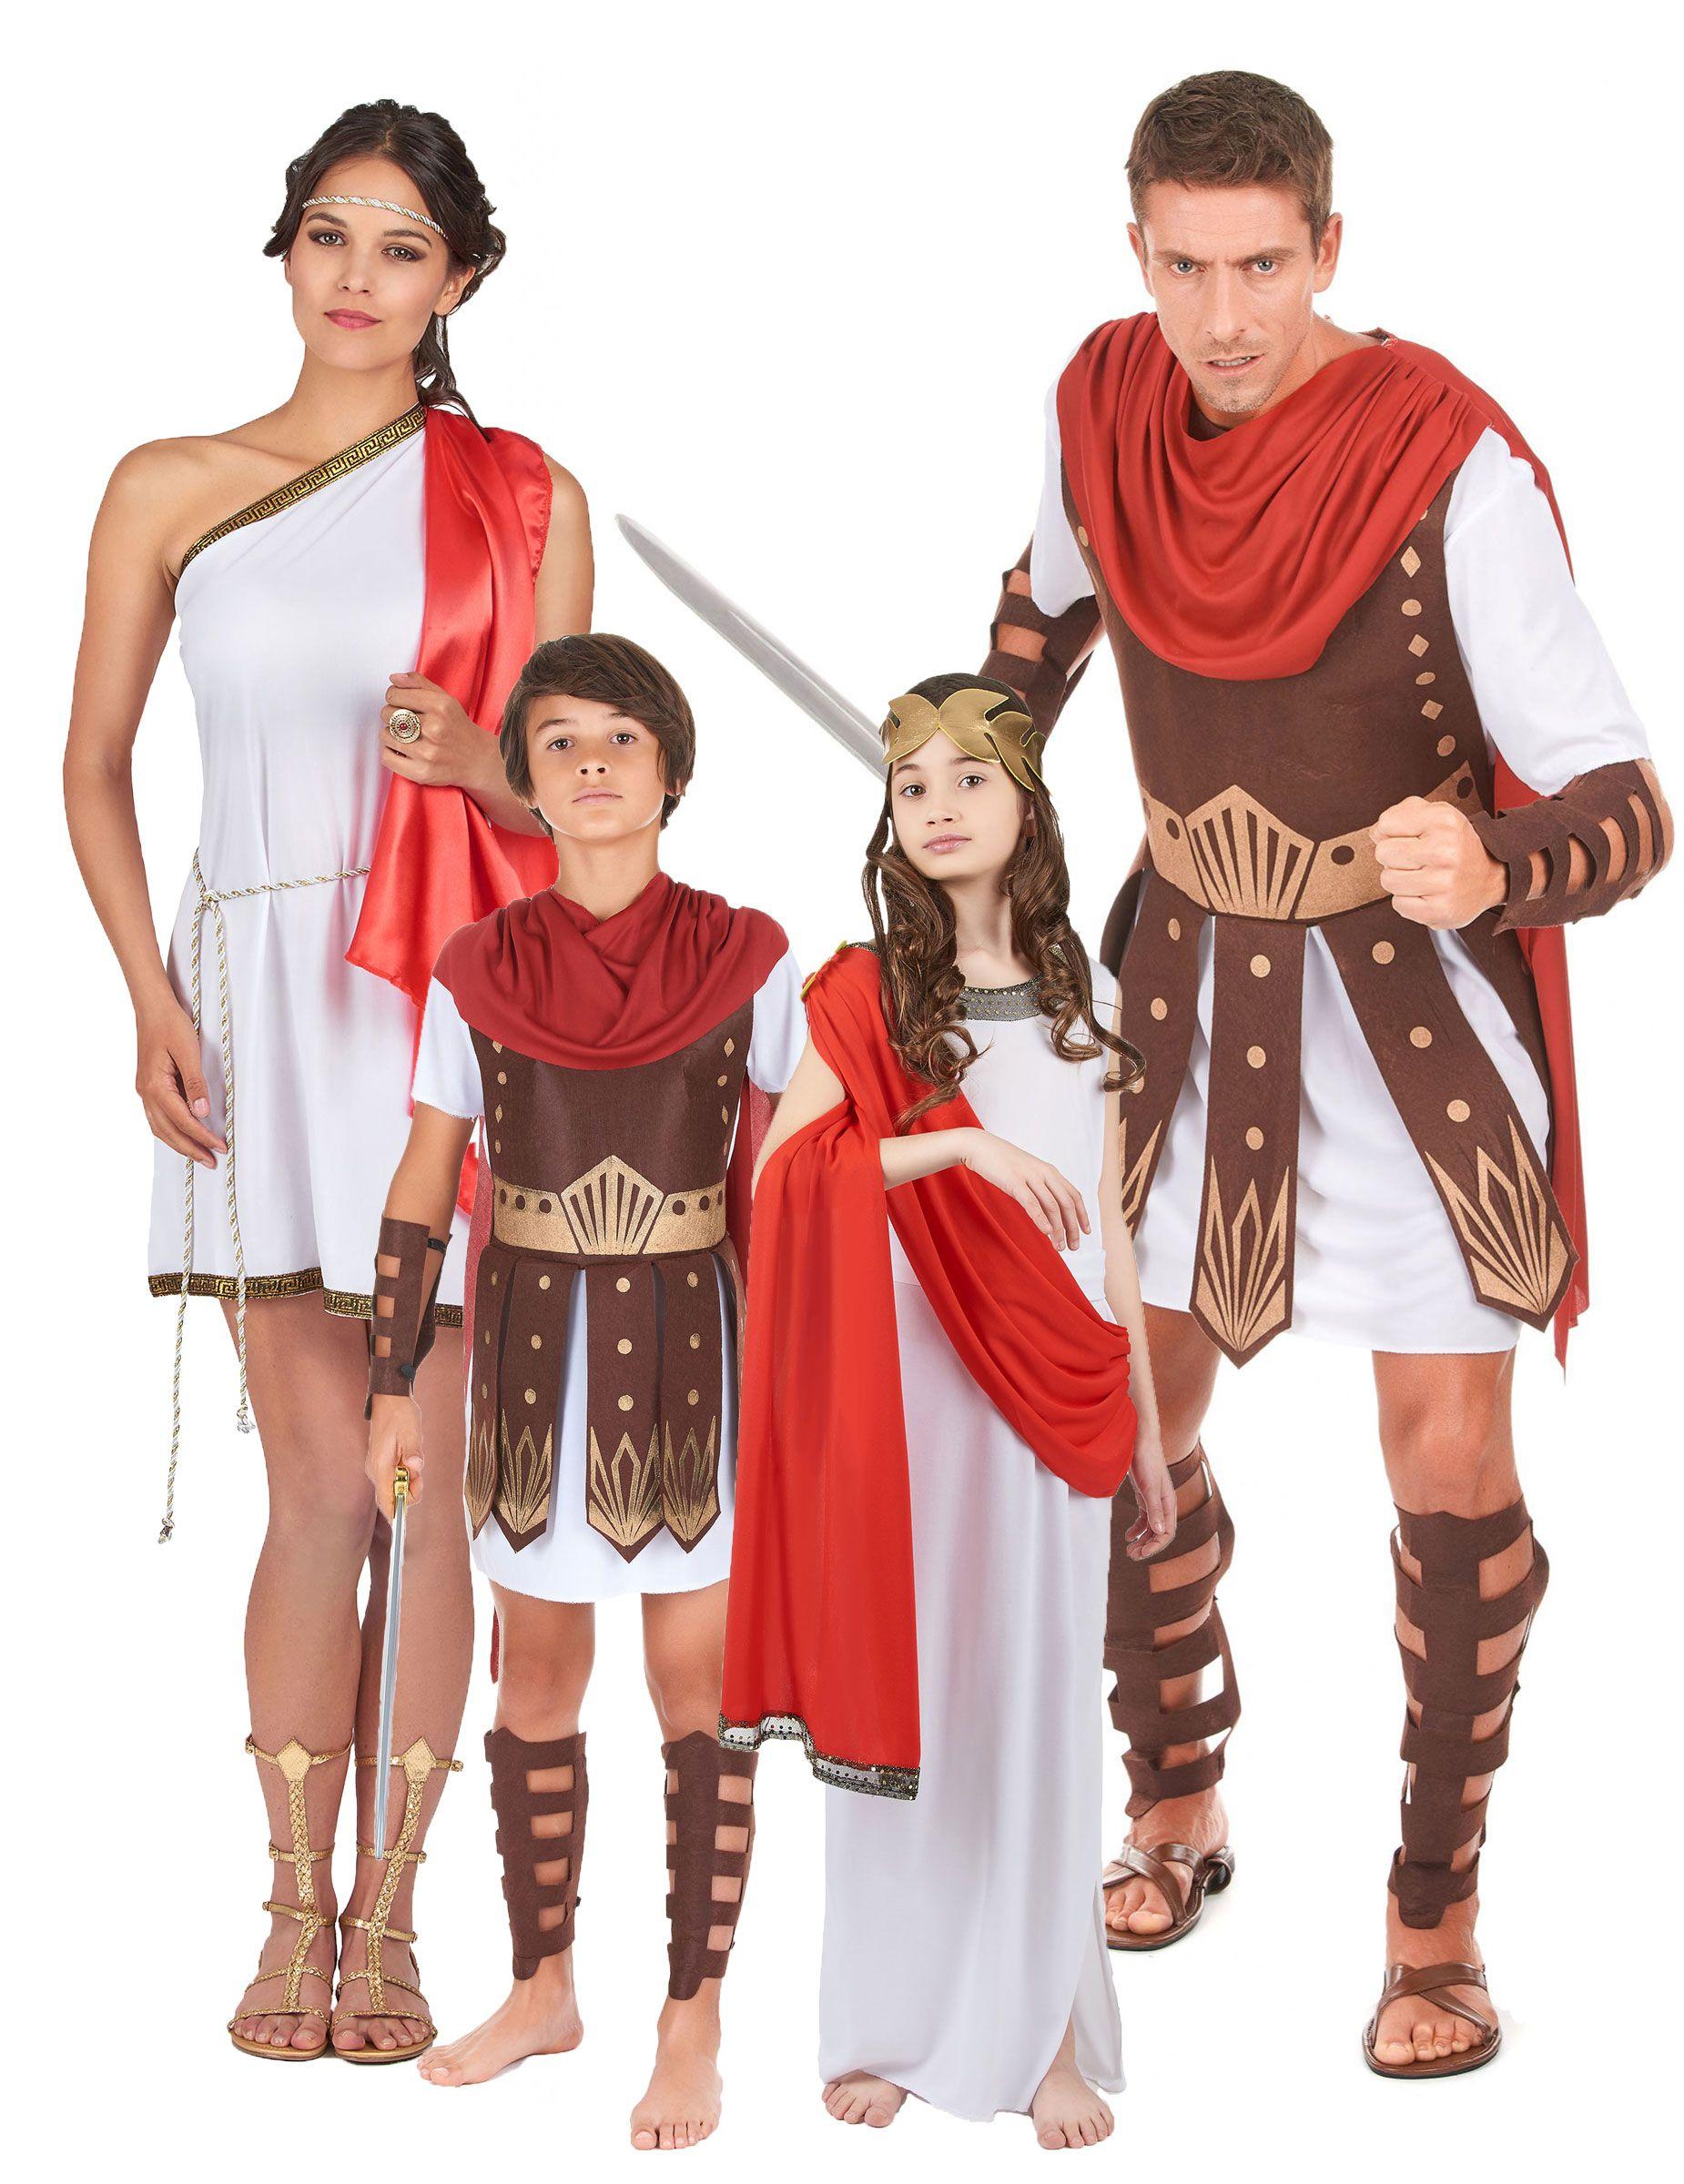 Disfraz familia Roma Antigua  Disfraz centurión romano niñoEste disfraz de  centurión romano para niño incluye túnica blanca de manga corta 3a9d16cae8ce